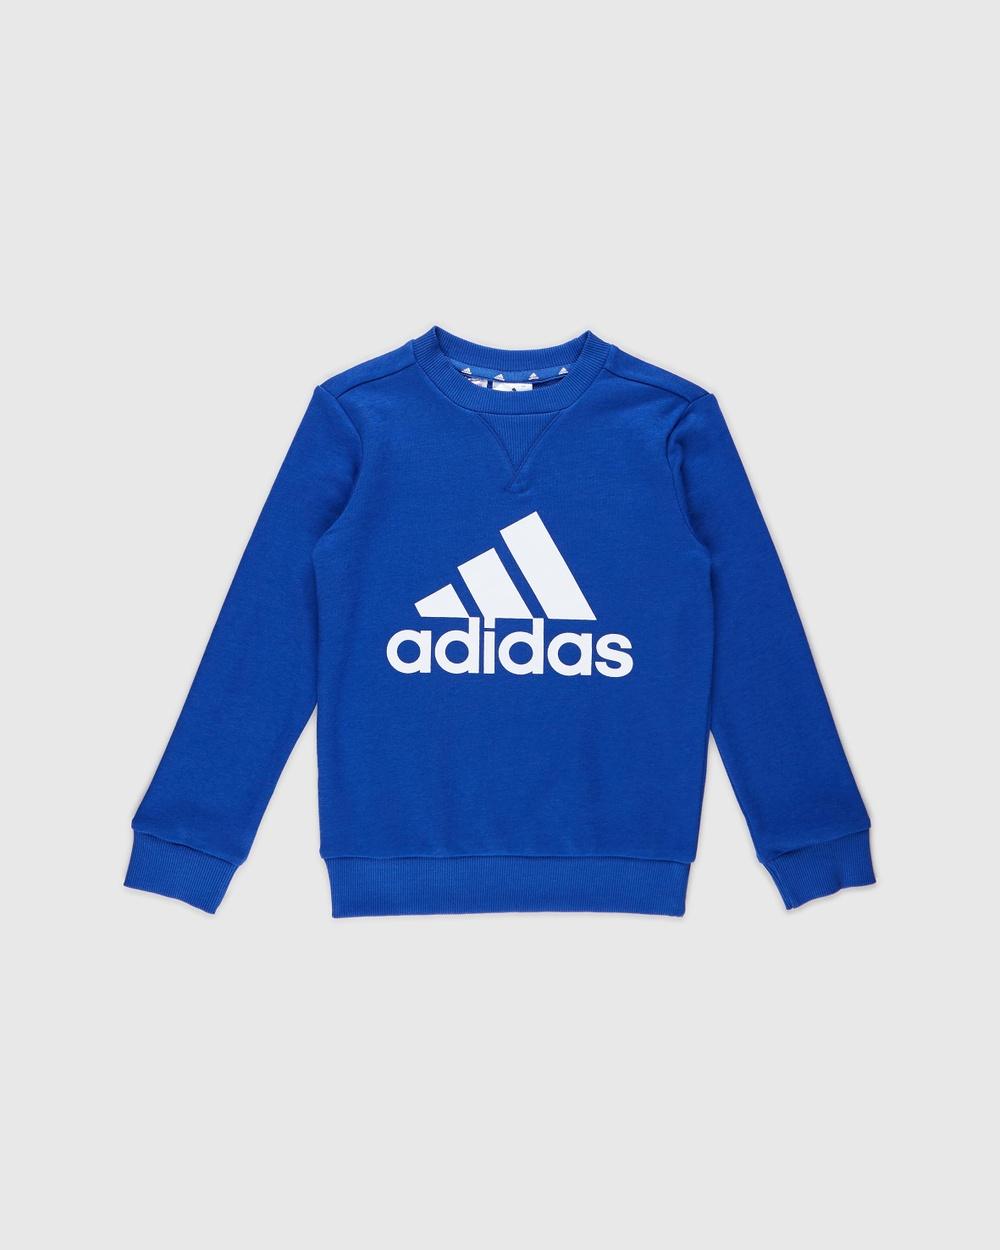 adidas Performance Essentials Sweatshirt Kids Teen Sweats Blue & White Kids-Teen